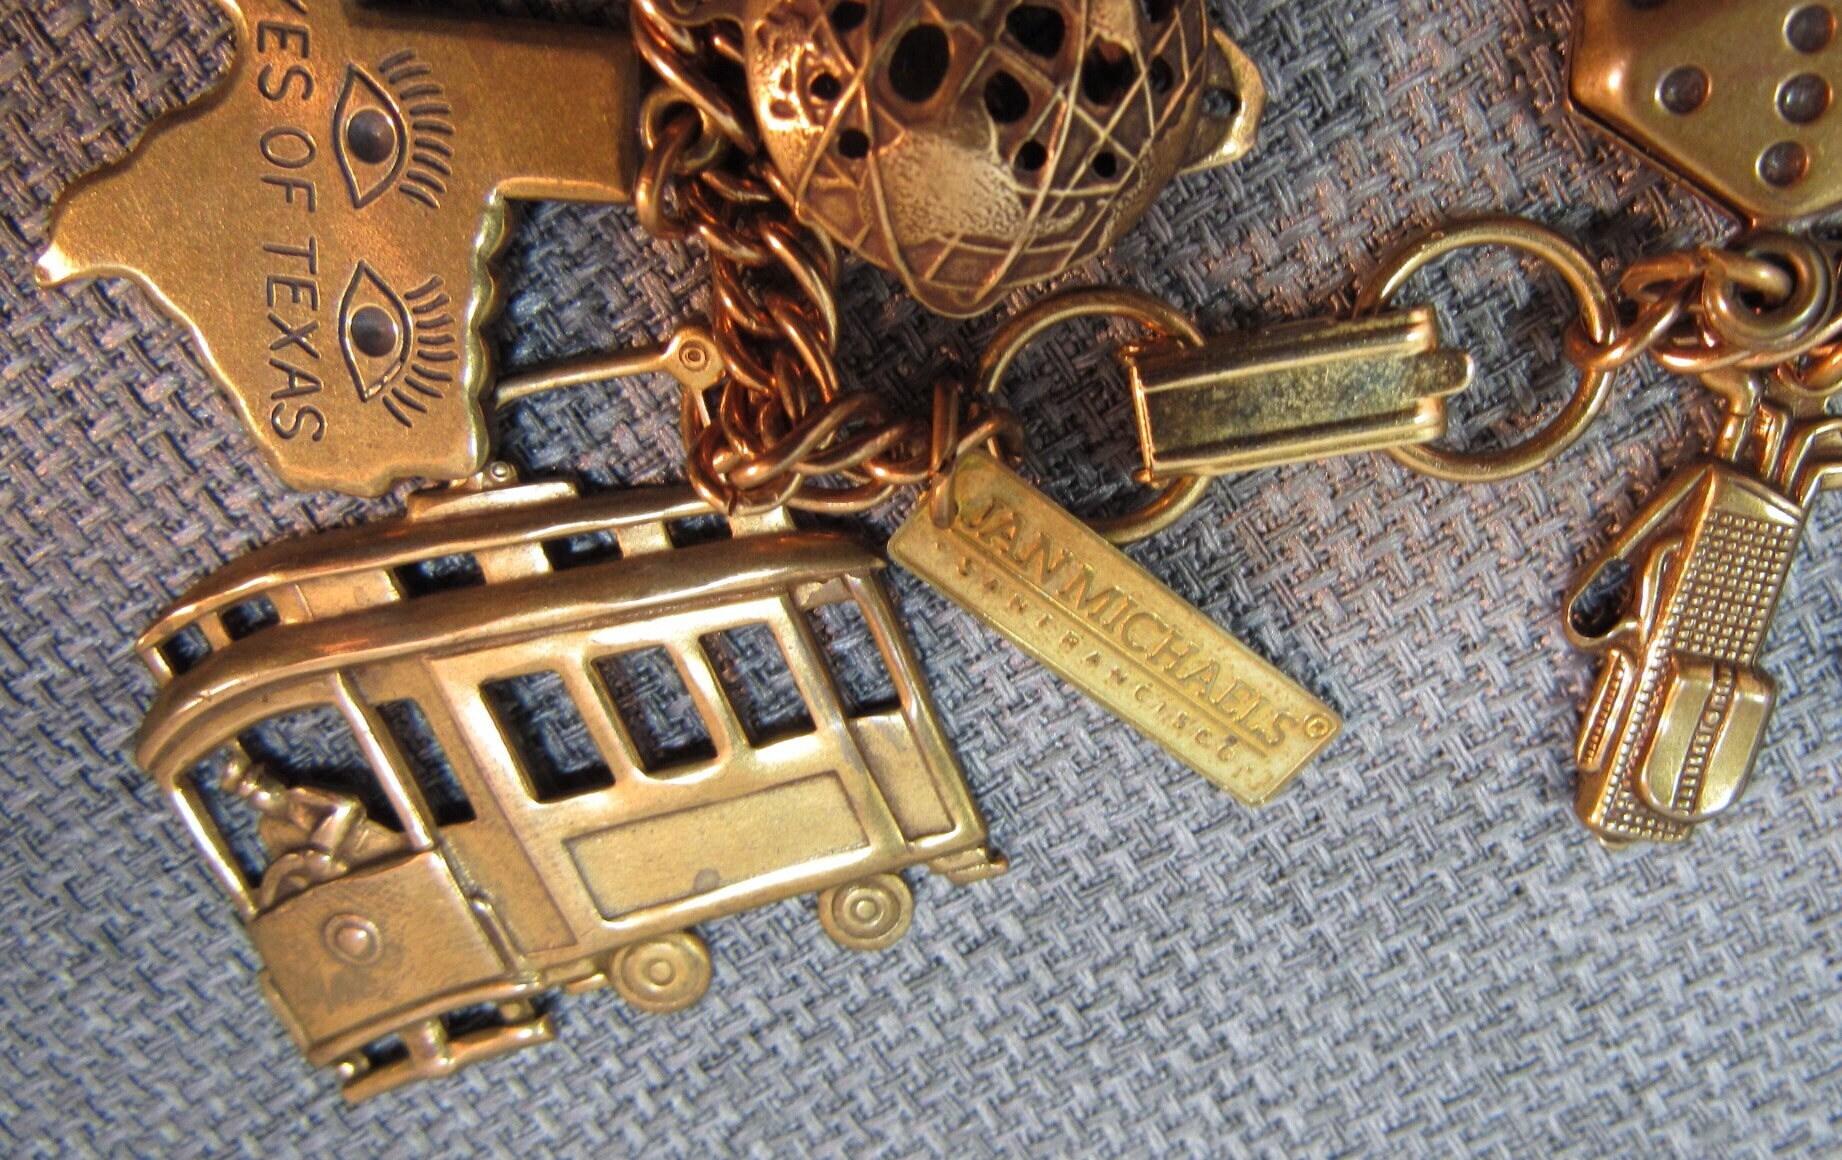 jan michaels of san francisco retired art deco usa traveler antique bronze charm bracelet amazing. Black Bedroom Furniture Sets. Home Design Ideas